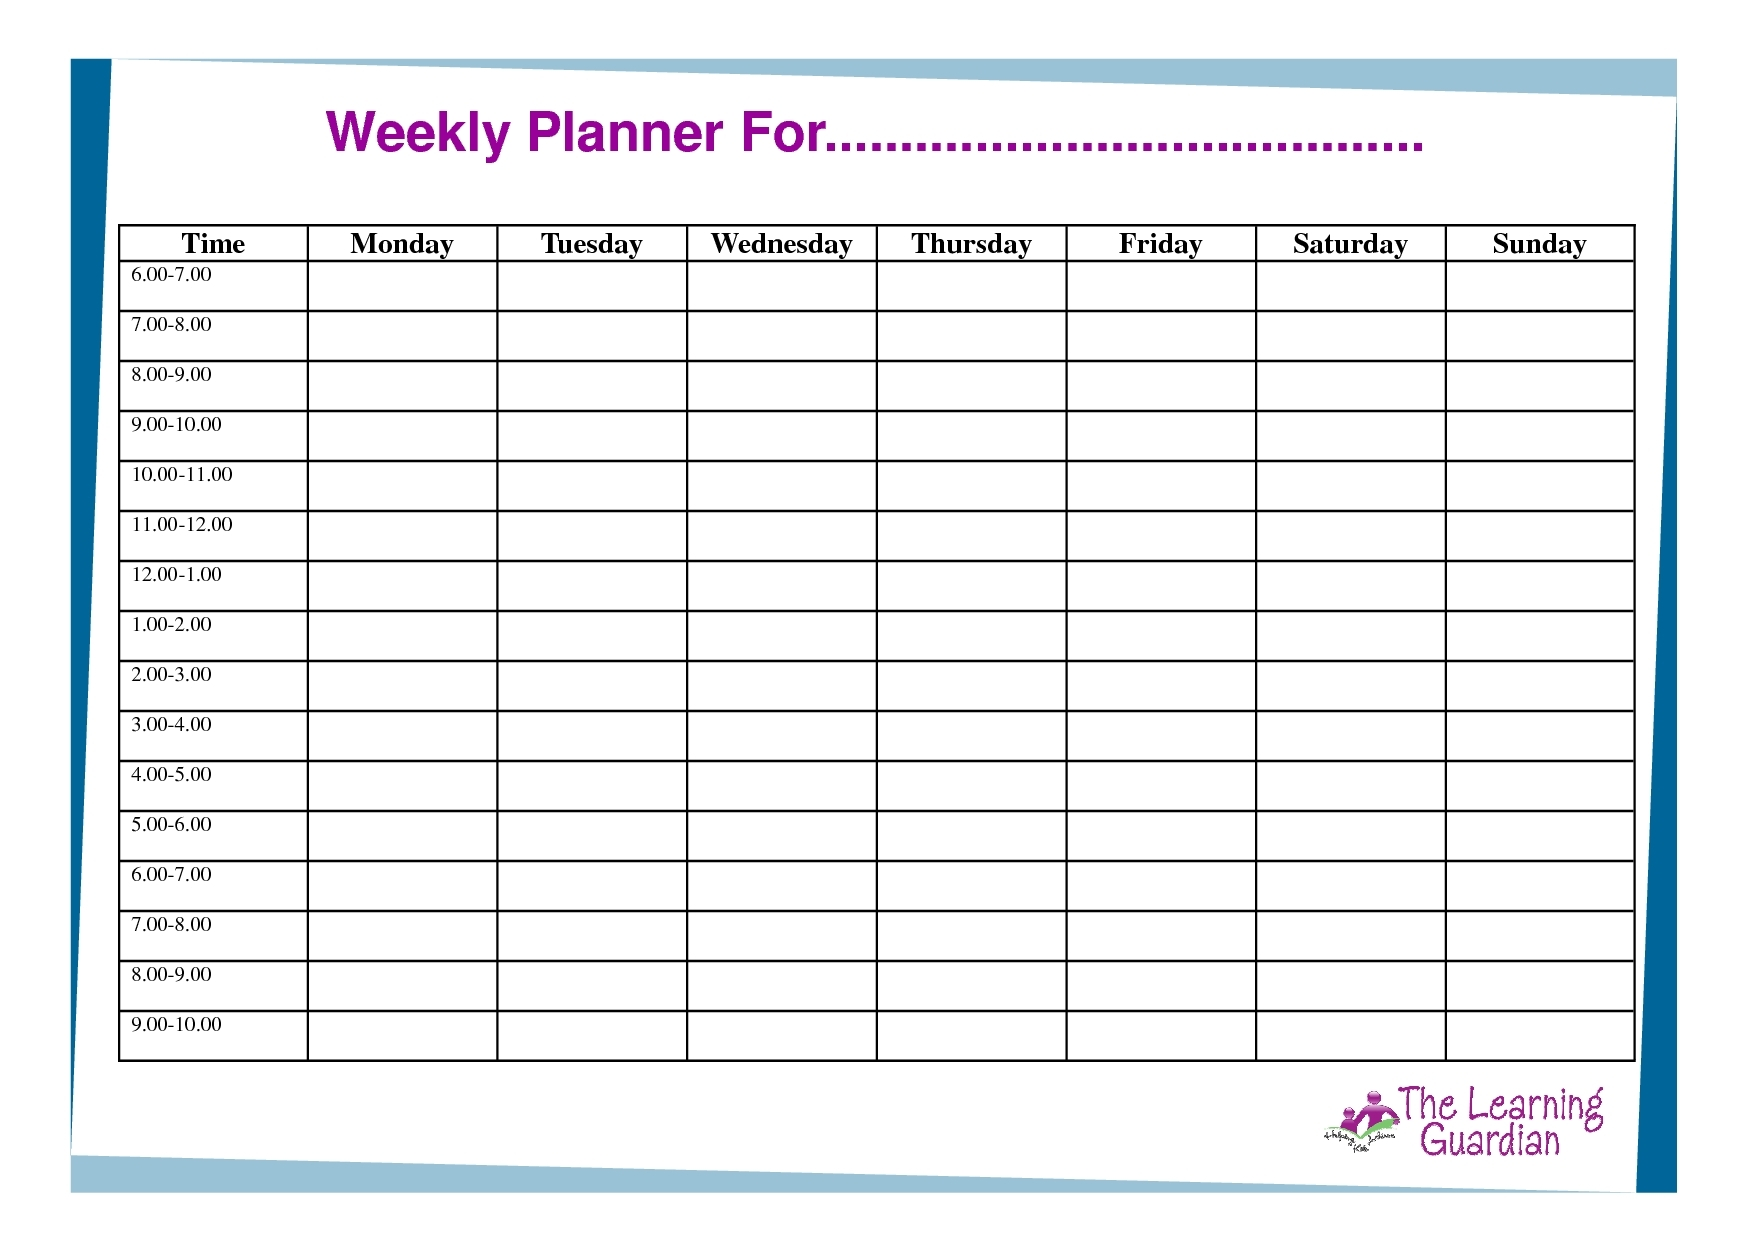 Week Calendar Template Day Blank | Smorad with Weekly Calendar Template 7 Day